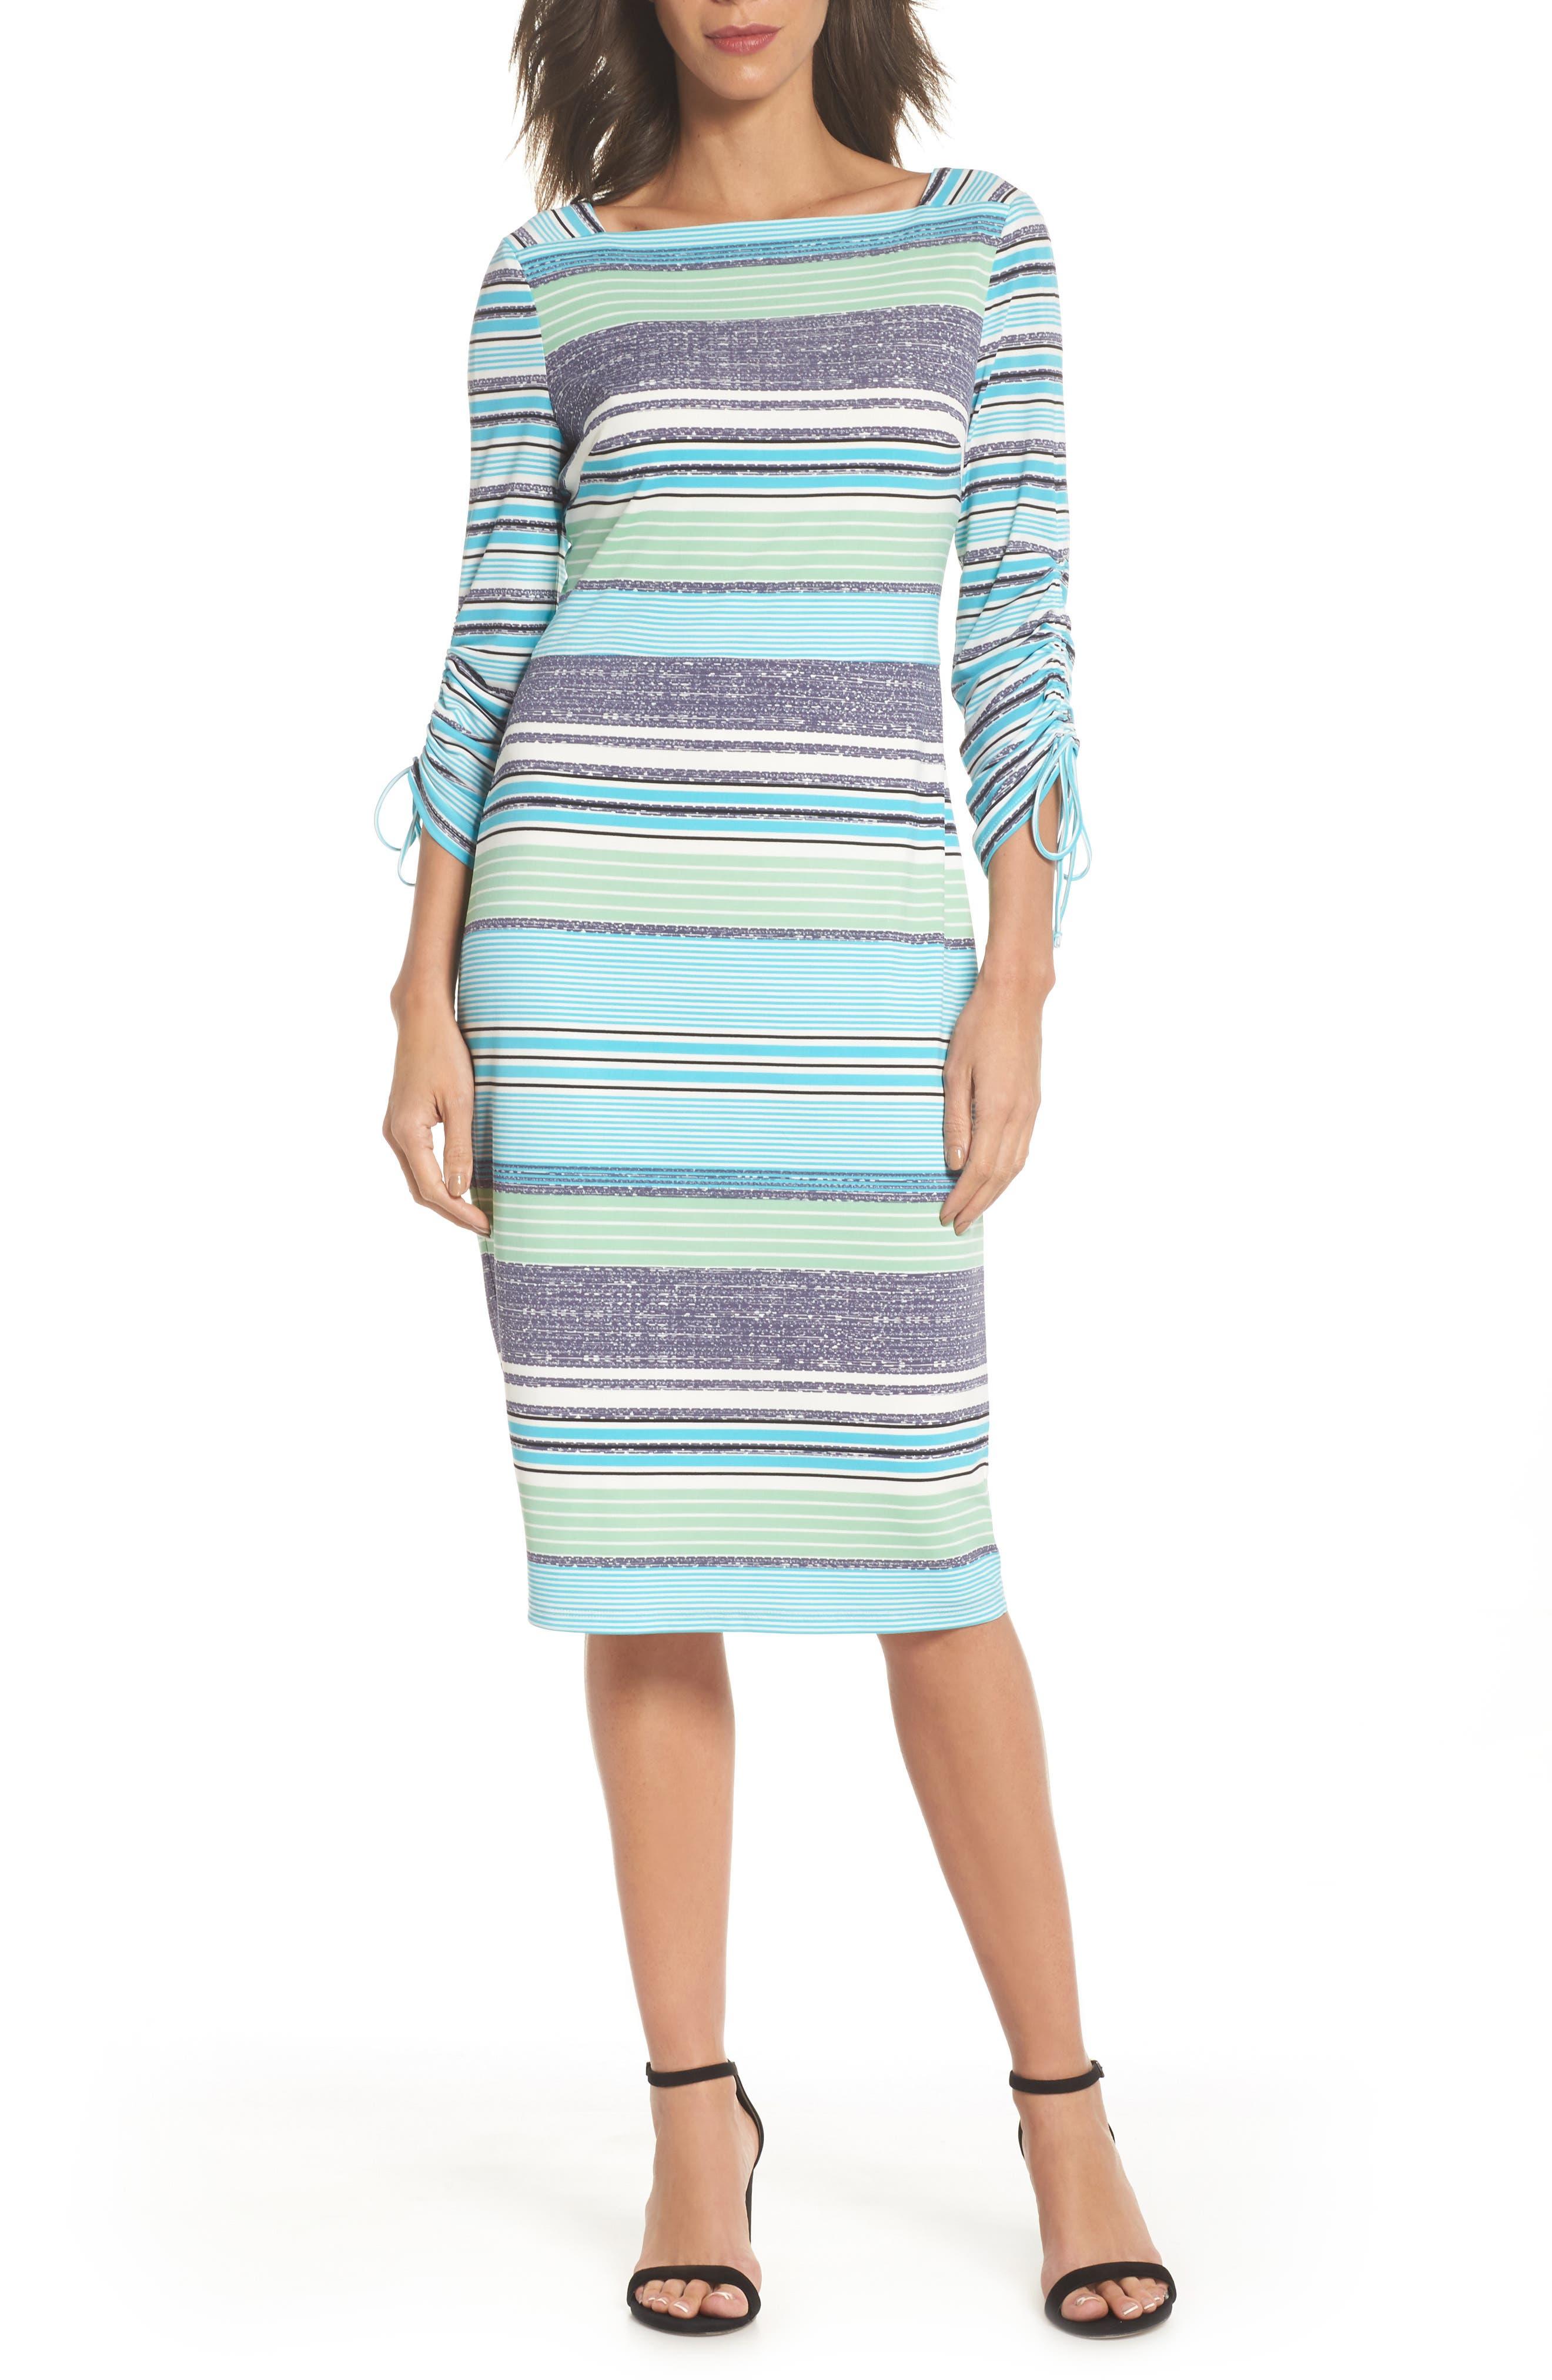 Ruched Sleeve Sheath Dress,                             Main thumbnail 1, color,                             White/ Aqua